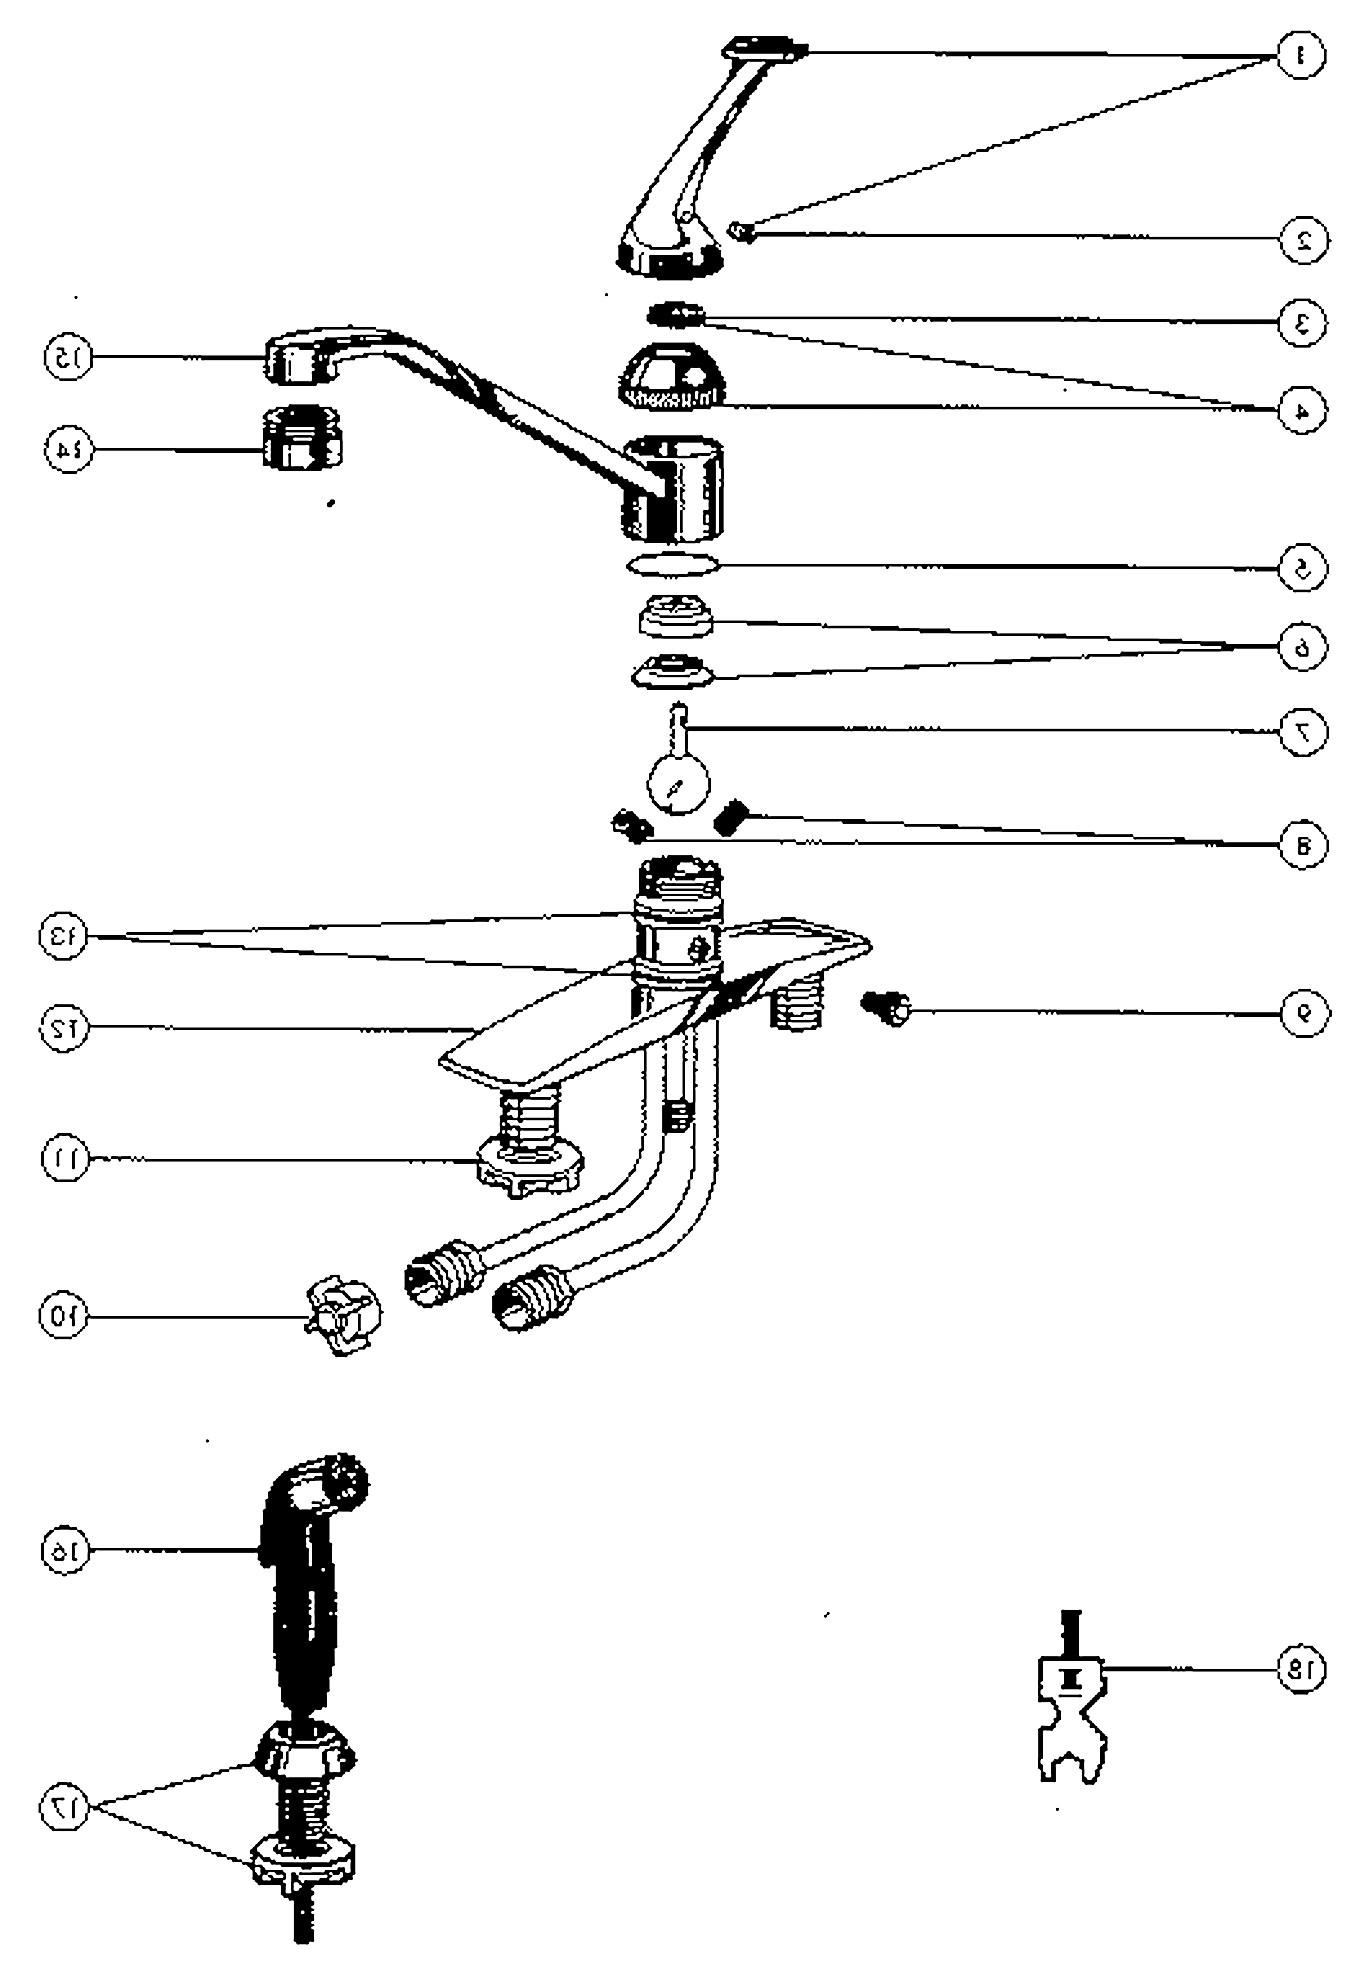 Fire Extinguisher Parts Diagram First Alert Fire